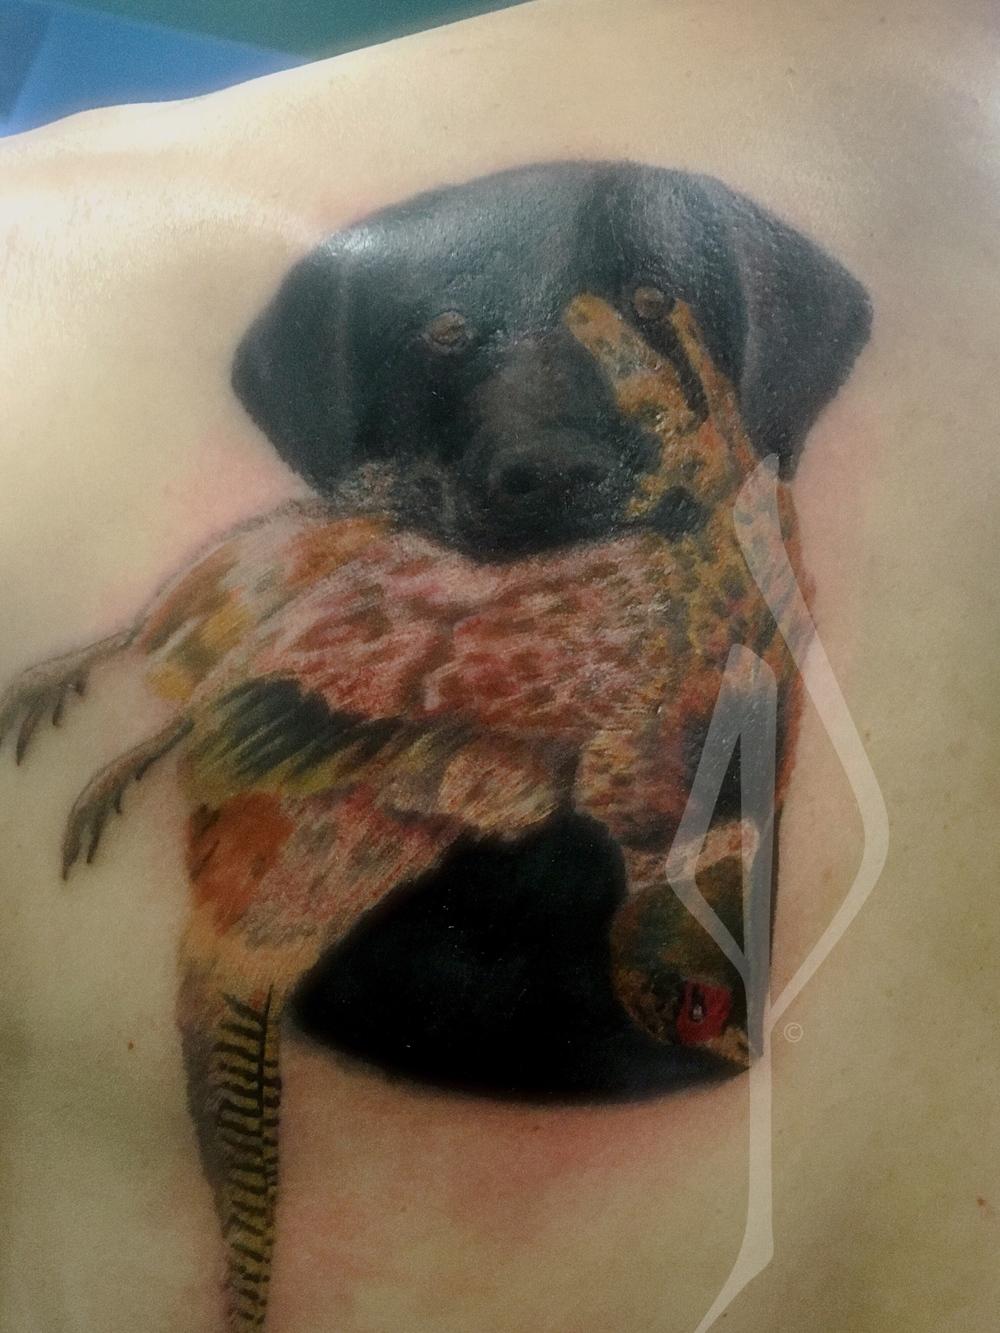 Bird Dog (Lab) with Phesant Tattoo by Jon Poulson - Aloha Salt Lake Tattoos